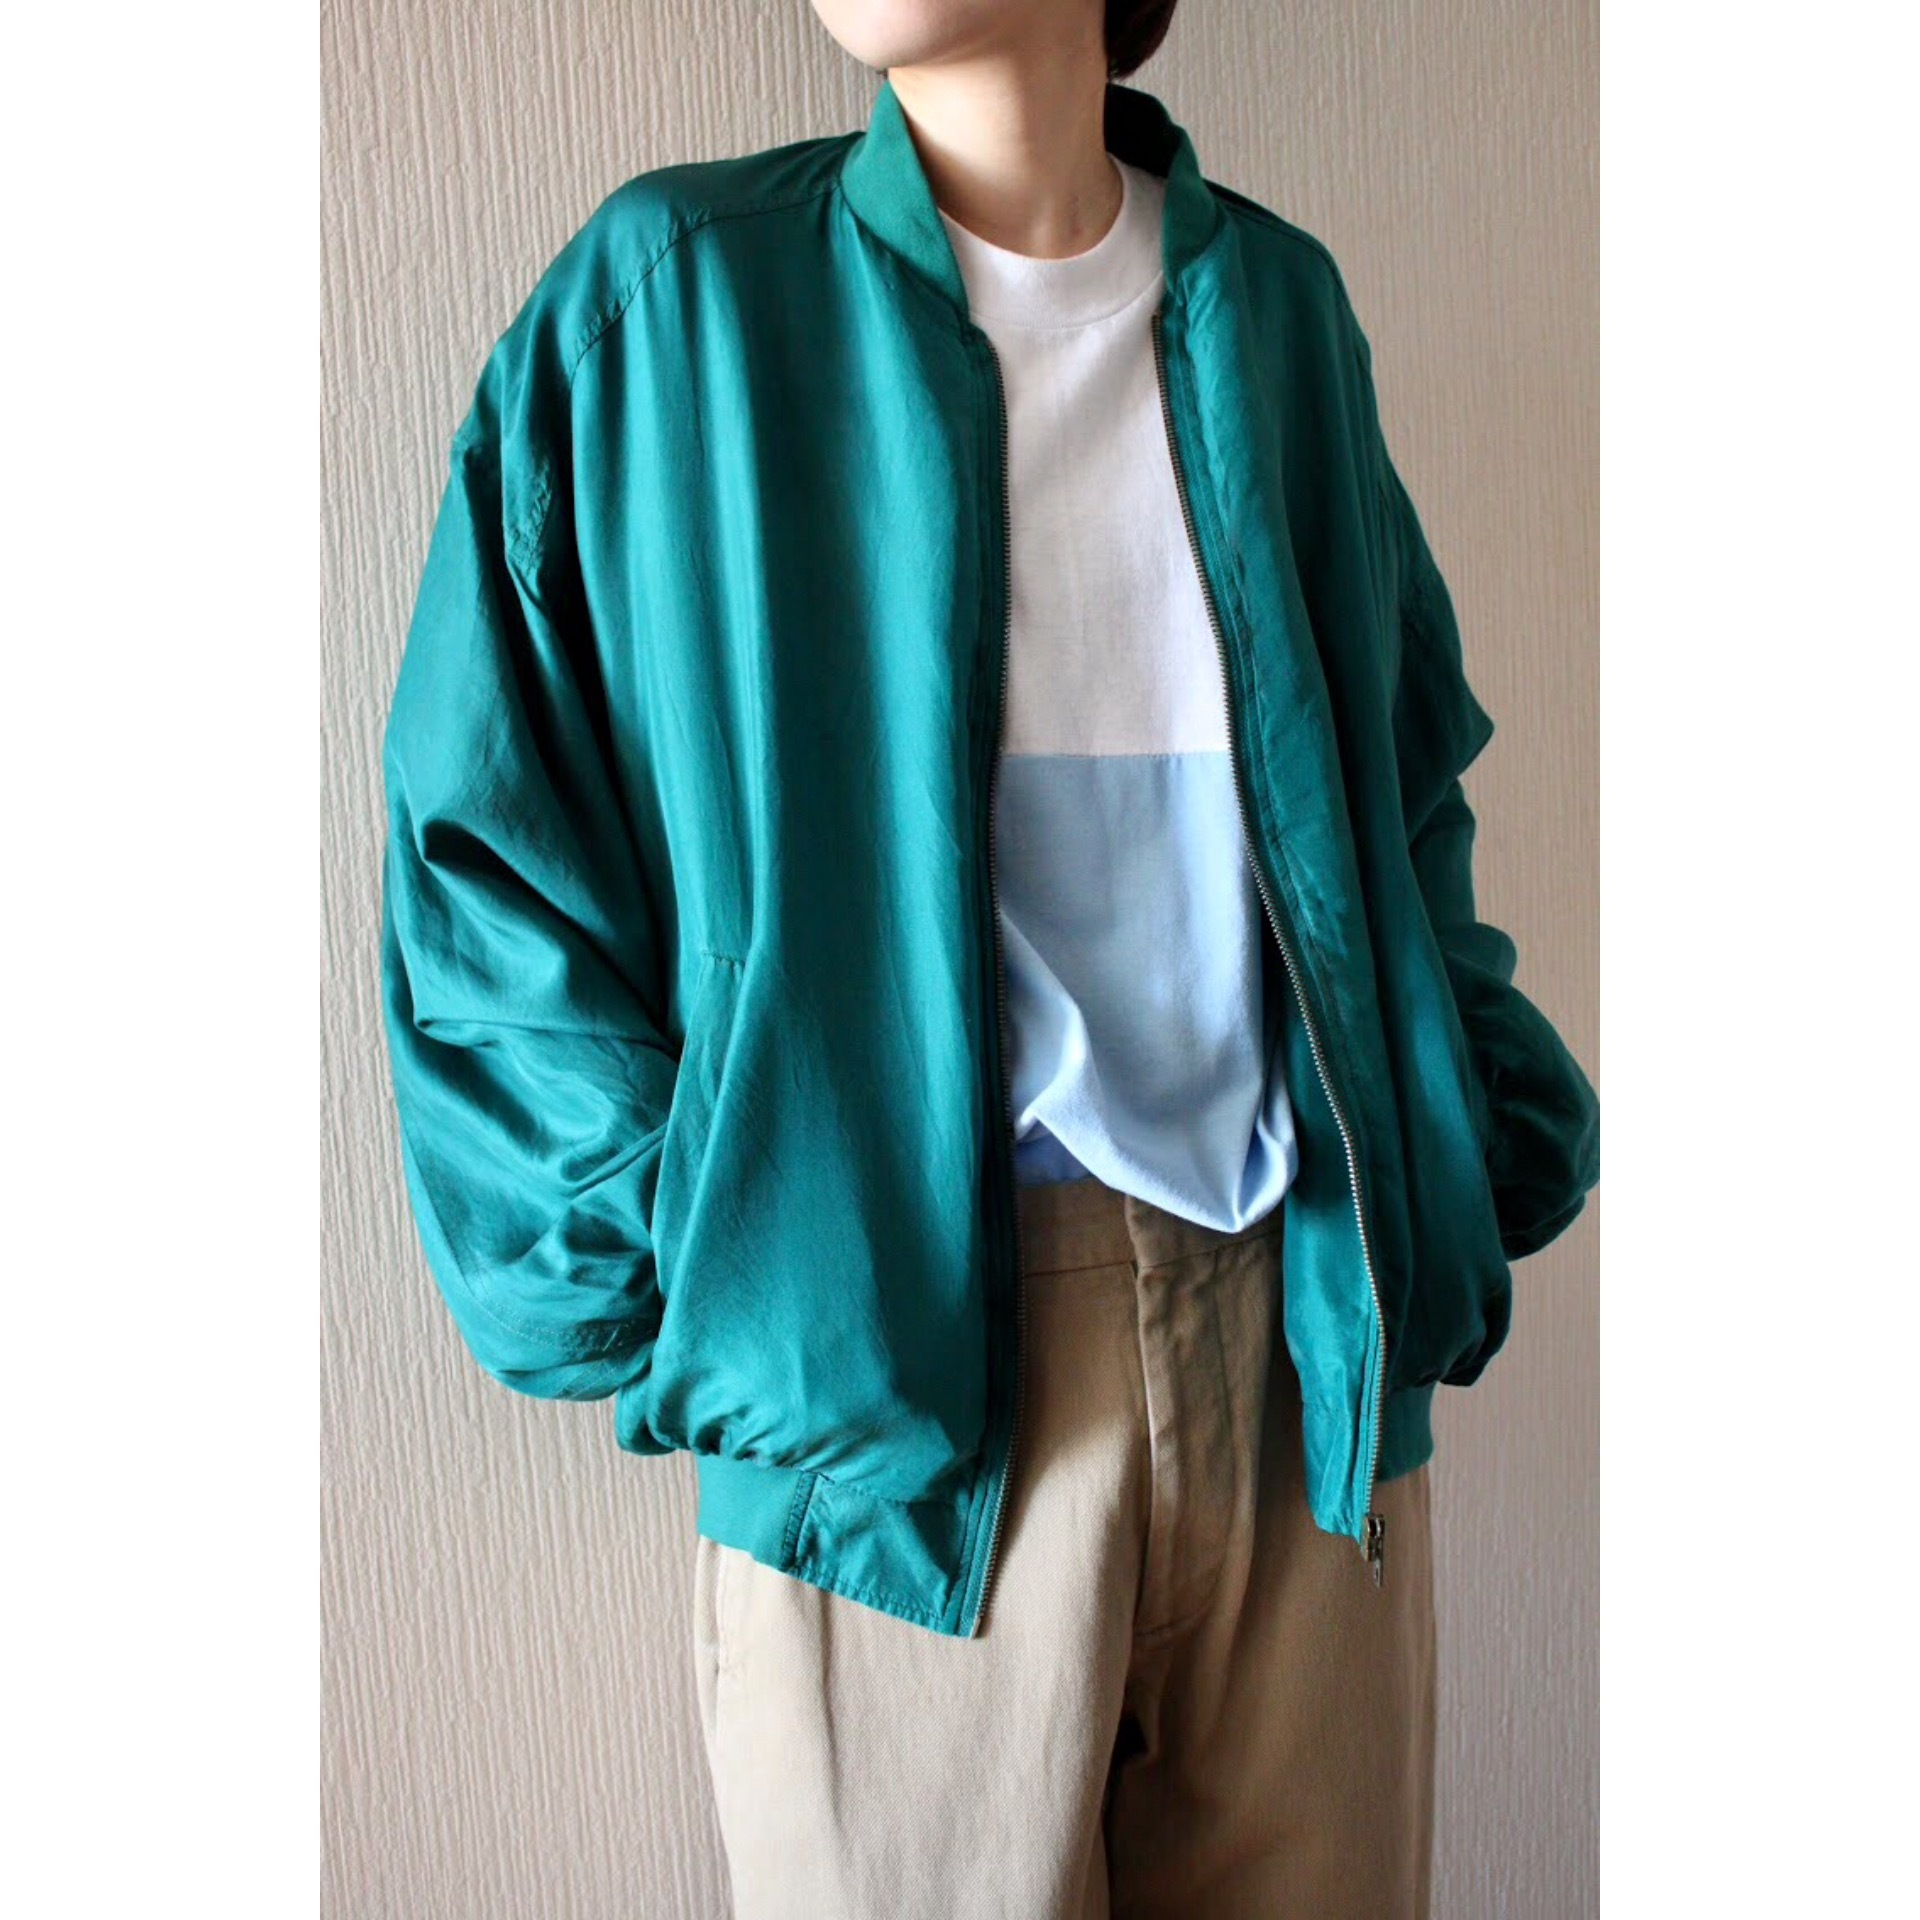 Vintage emerald green silk blouson